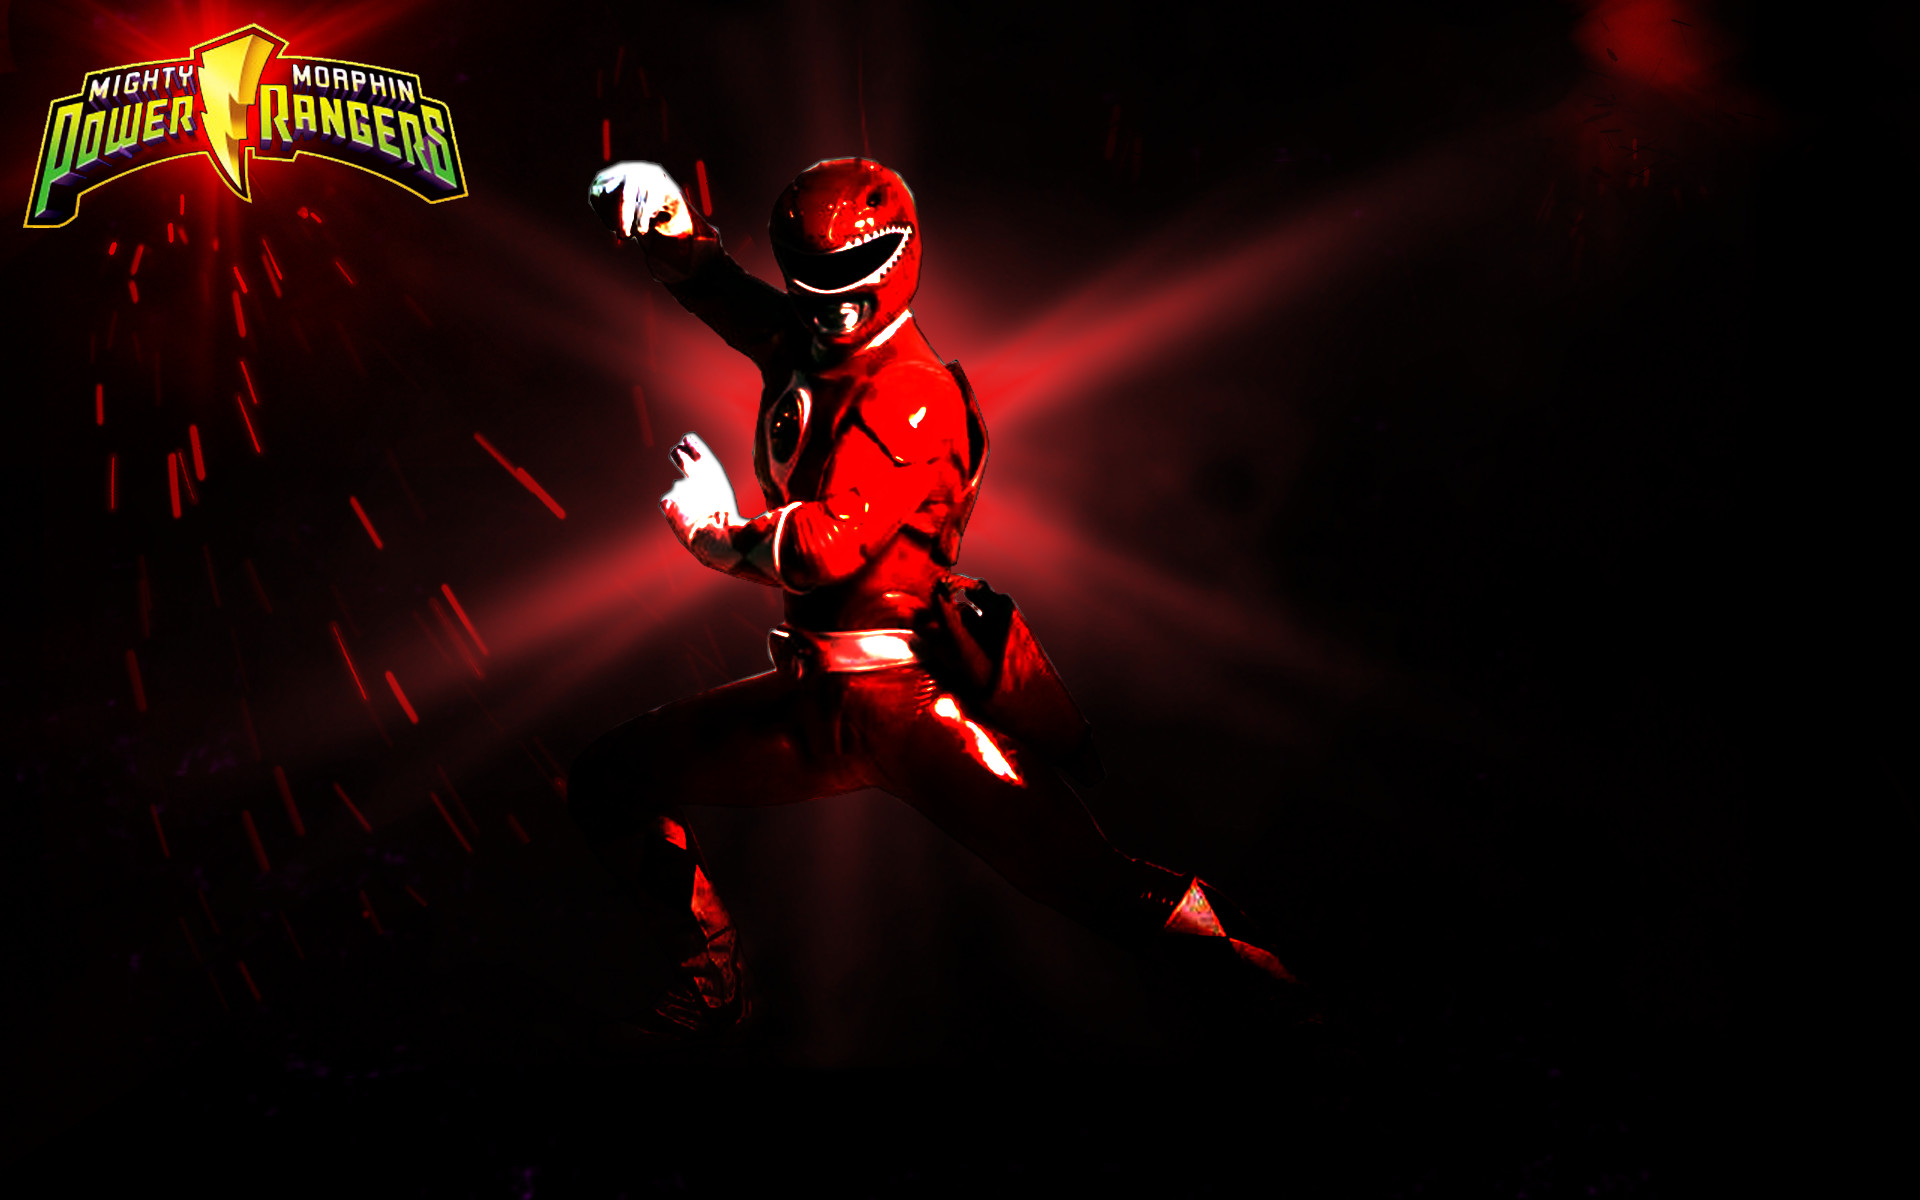 Power Rangers Wallpaper Power, Rangers